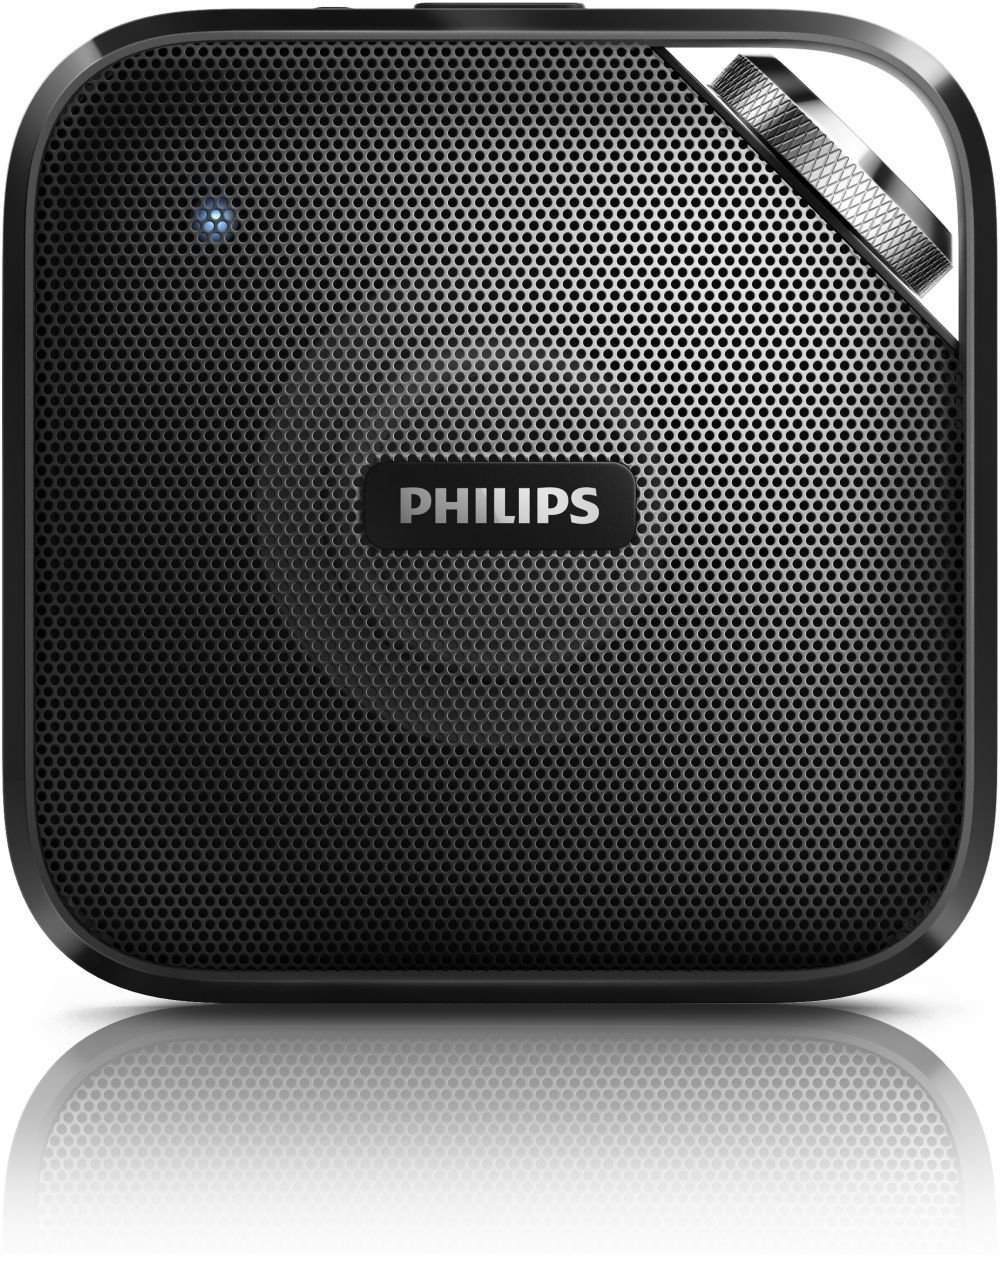 BT2500B 37 Wireless Portable Bluetooth